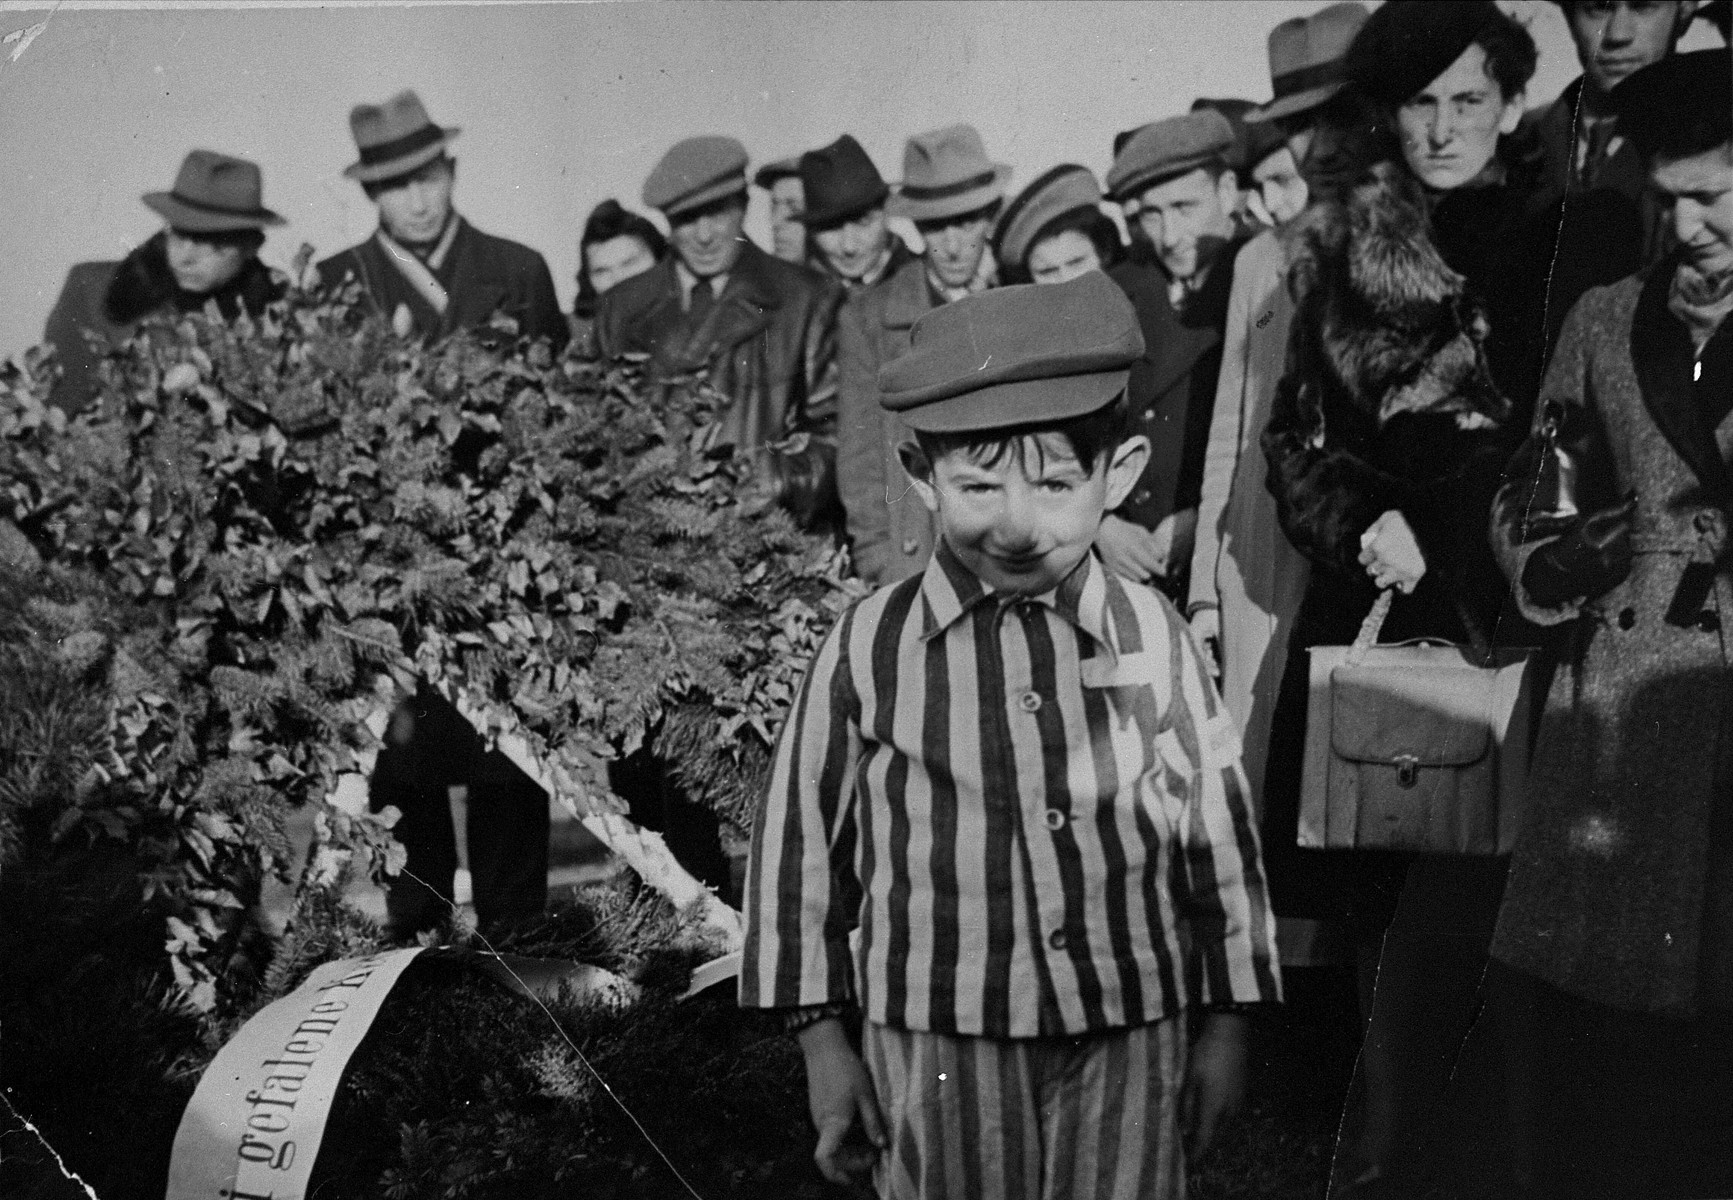 Dressed in his former concentration camp uniform, the Jewish DP child Joseph Schleifstein attends a memorial service in Buchenwald.